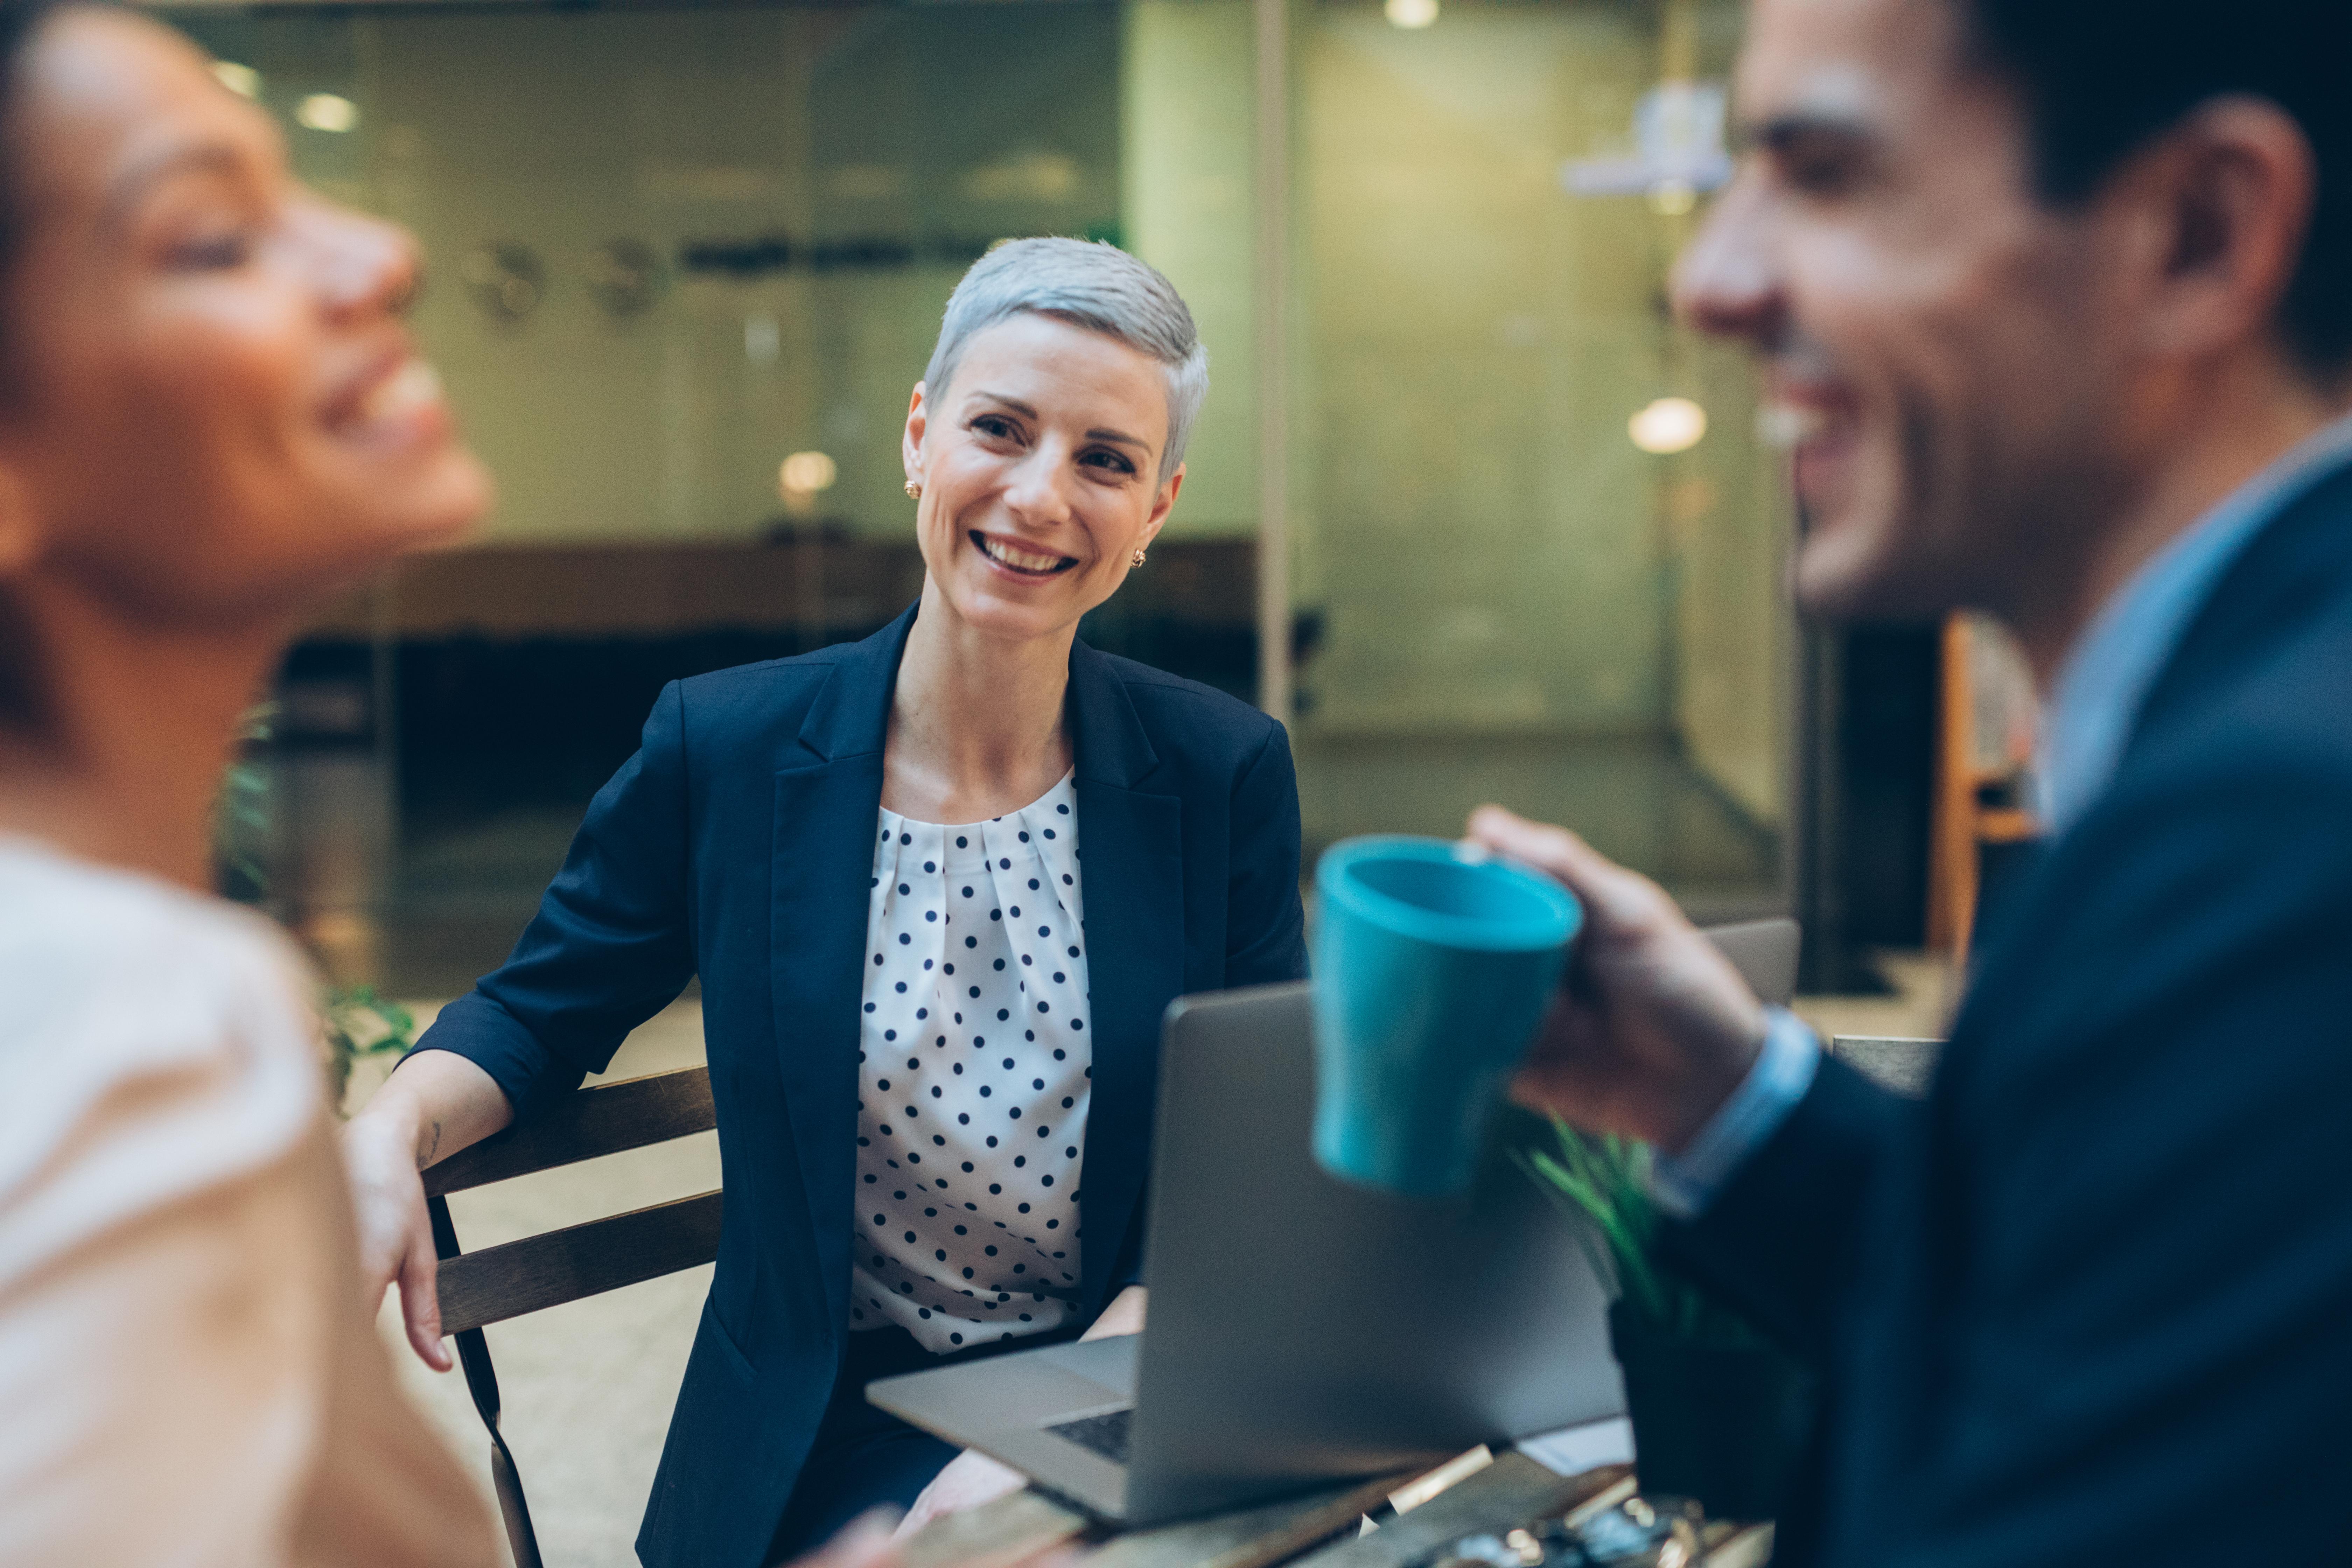 How Does Poor Communication Affect an Organization? | Bizfluent